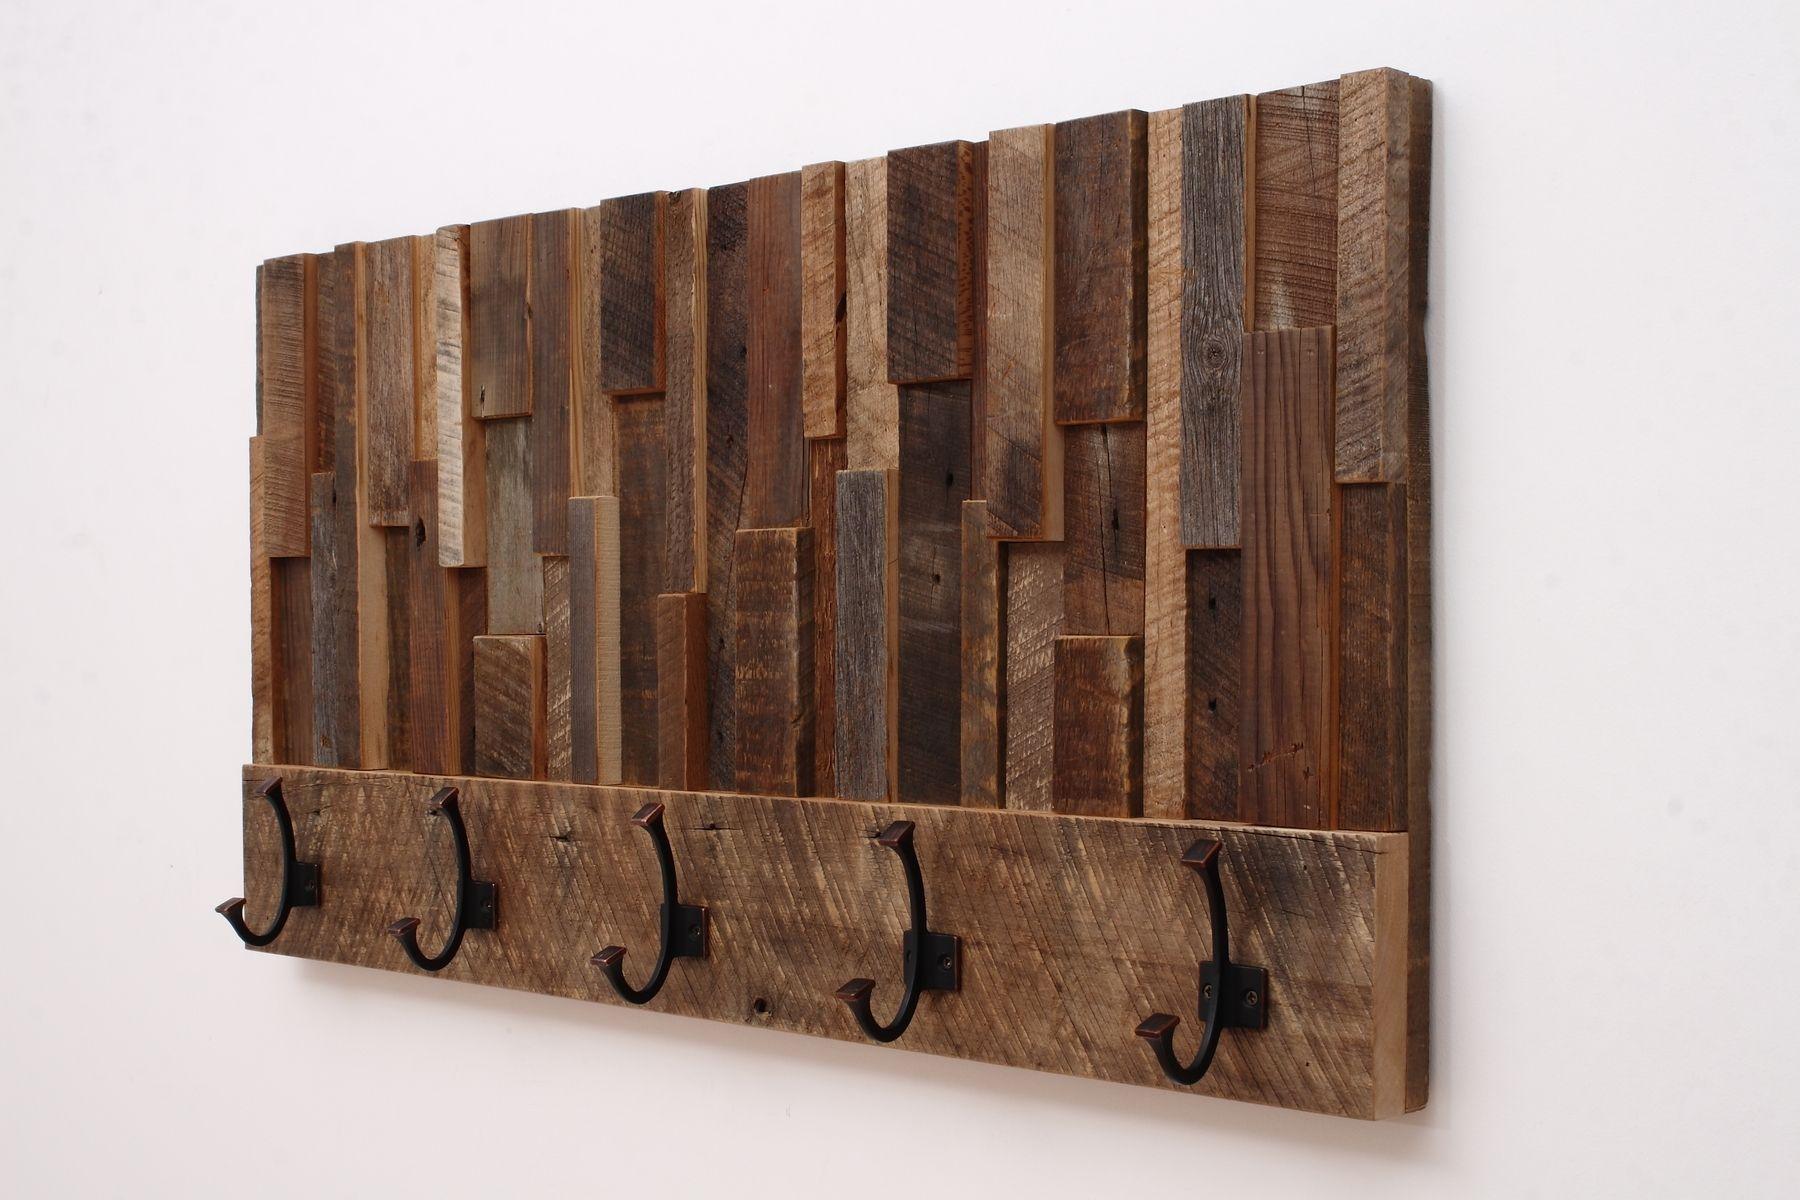 Custom Made Reclaimed Wood Art Coat Rack 36x185x4 By